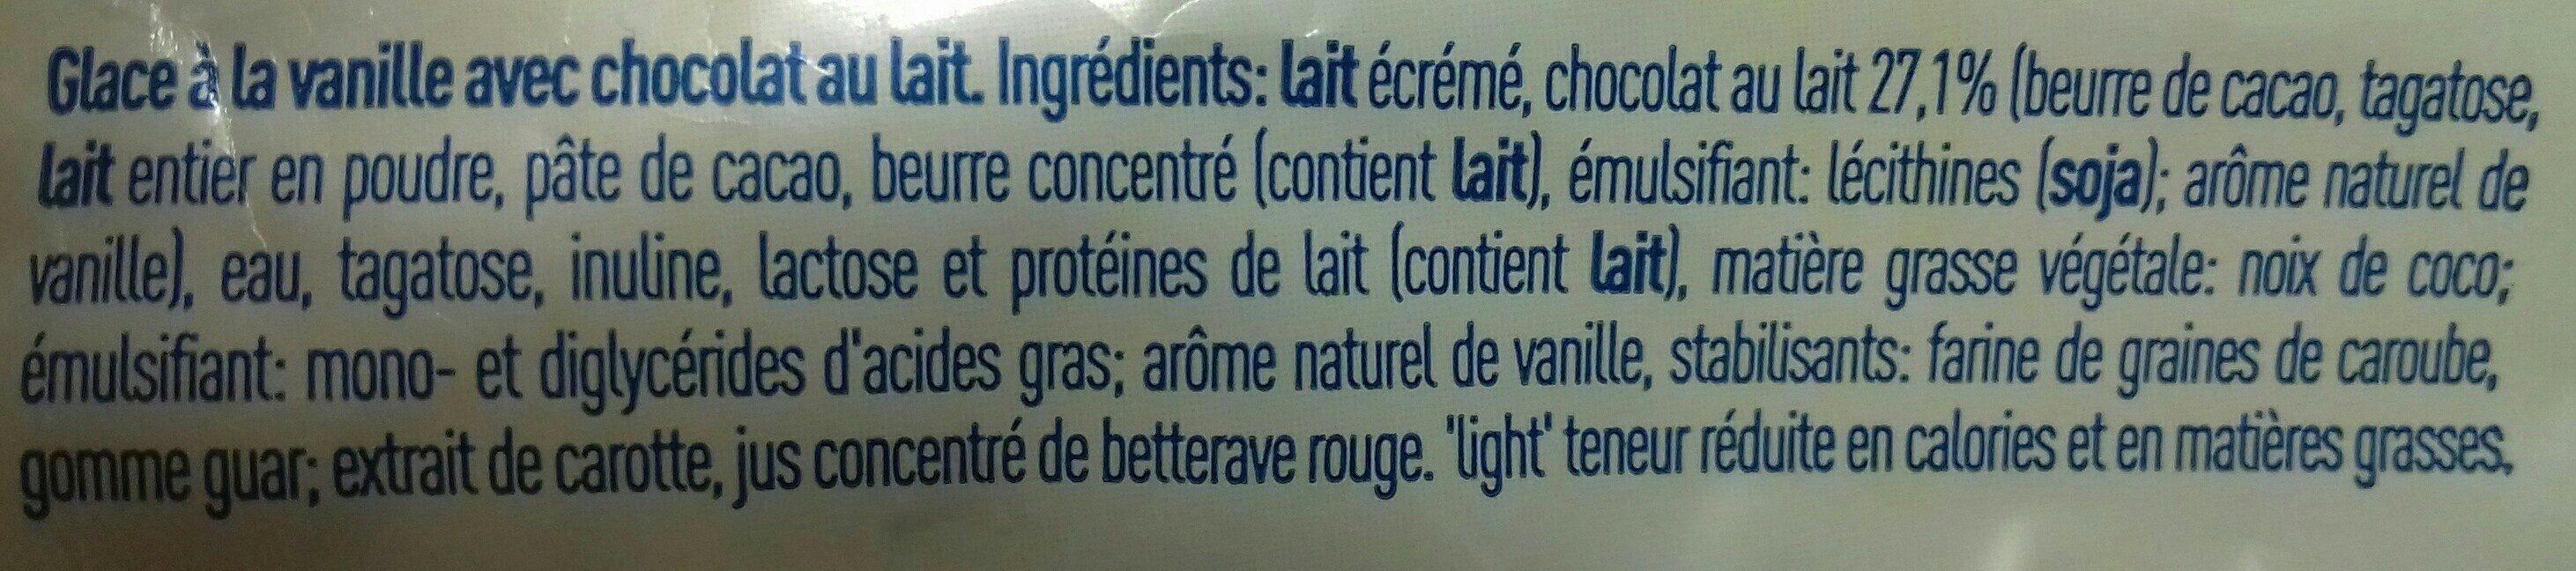 Icy light vanille stick - Ingredientes - fr